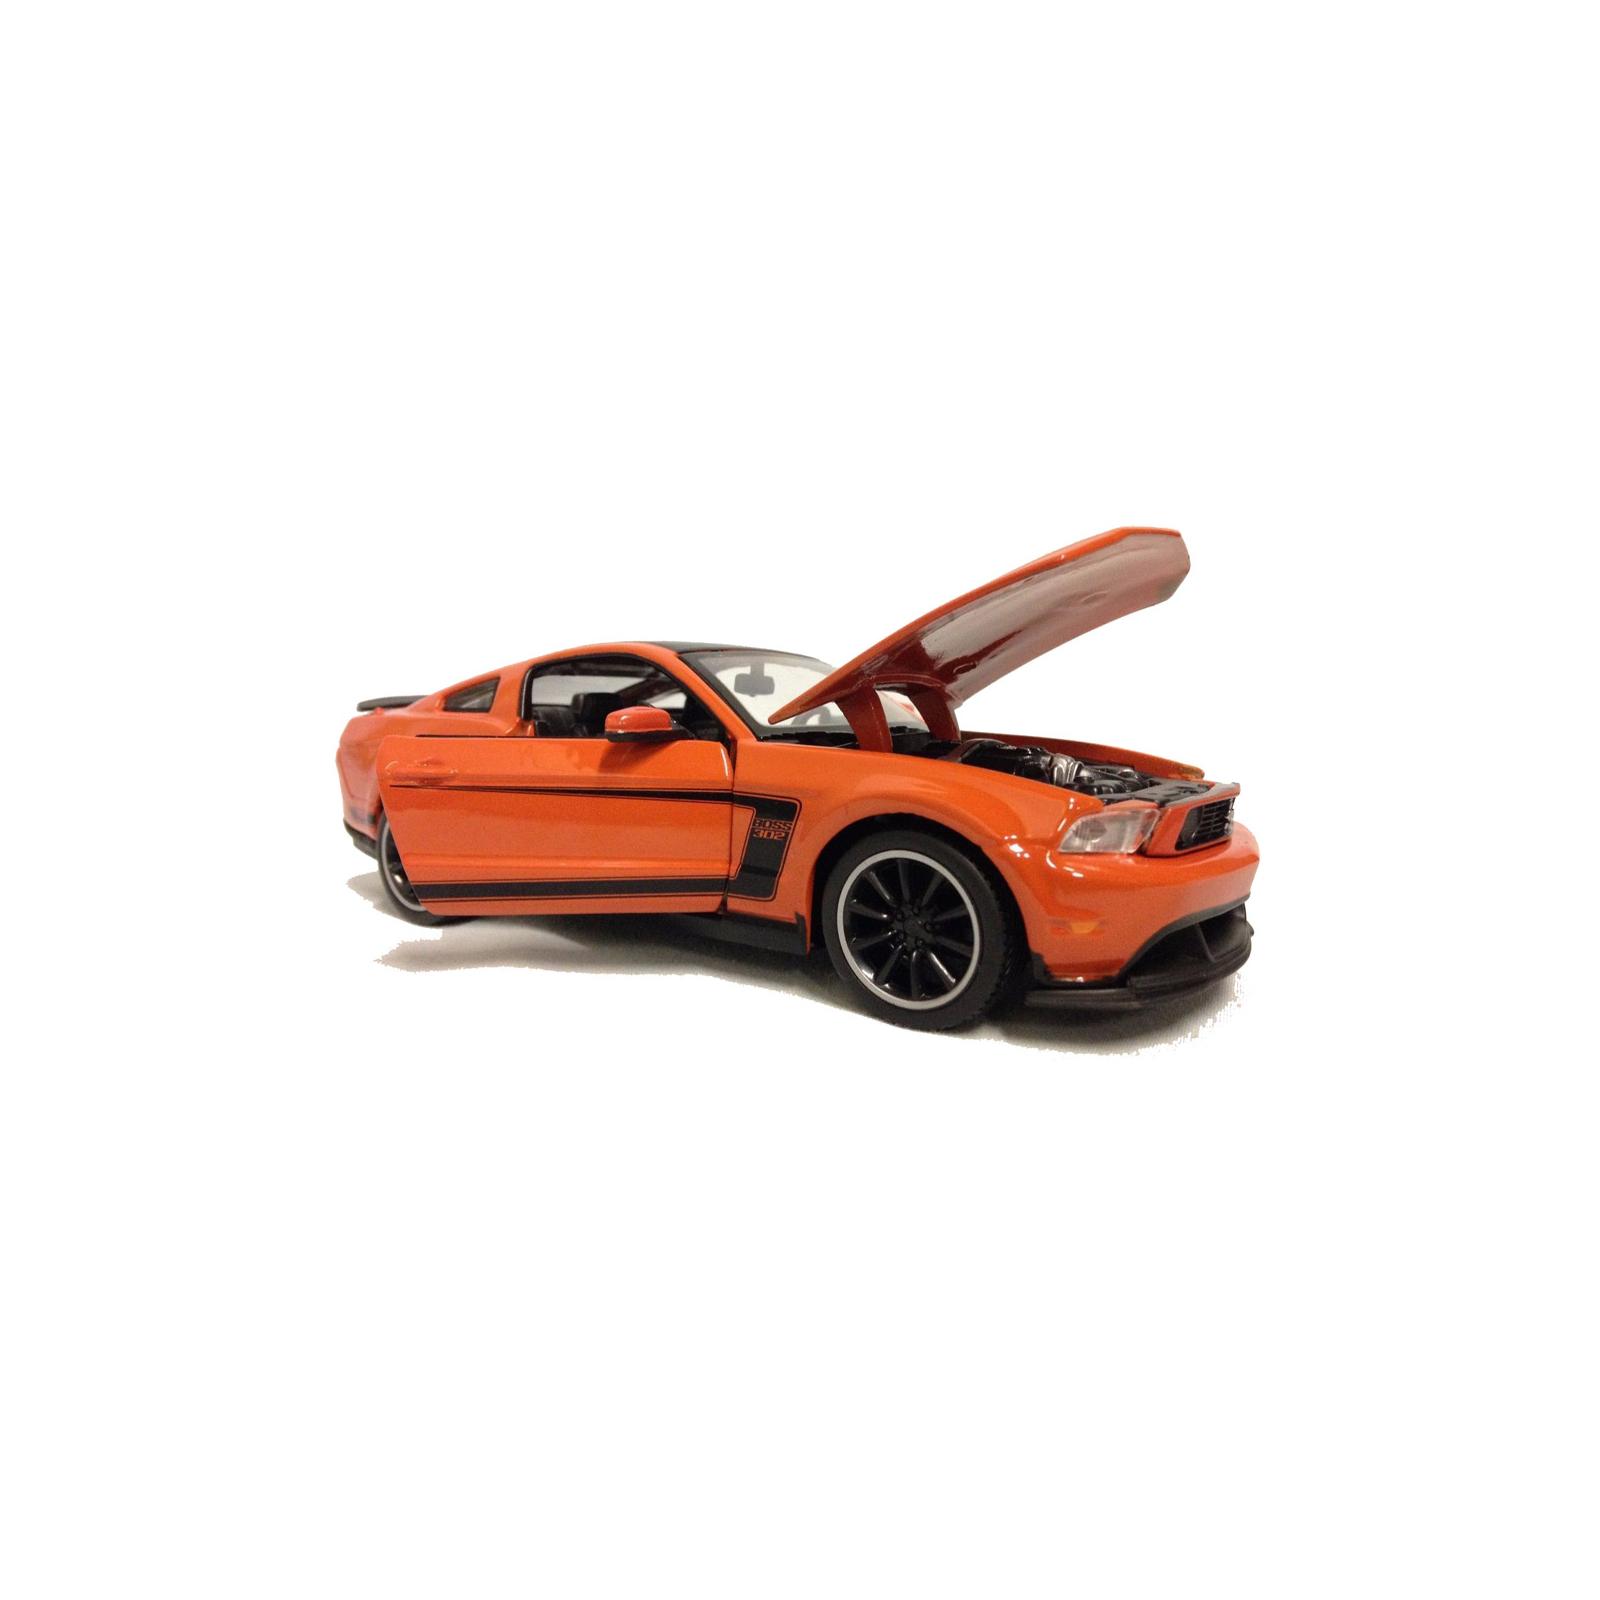 Машина Maisto Ford Mustang Boss 302 (1:24) оражевый (31269 orange) изображение 4